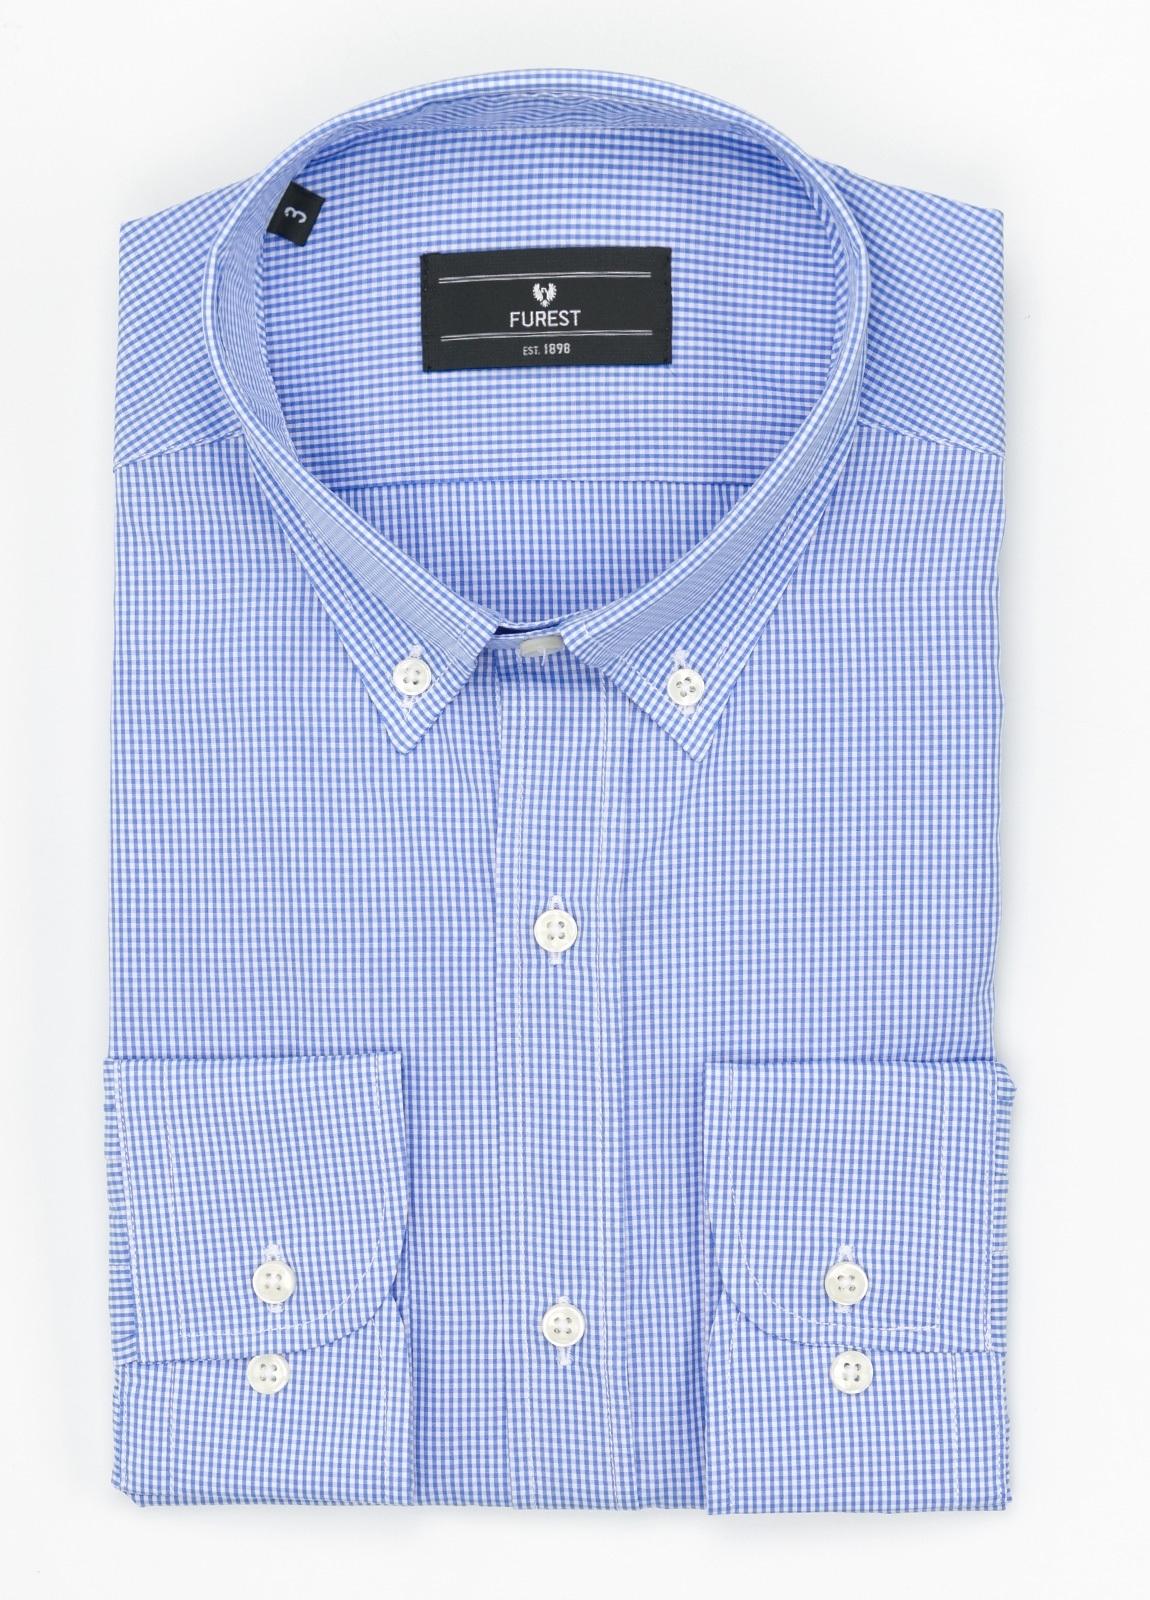 Camisa Formal Wear REGULAR FIT modelo BOTTON DOWN, con bolsillo, tejido de cuadro vichy, color azul celeste. 100% Algodón.